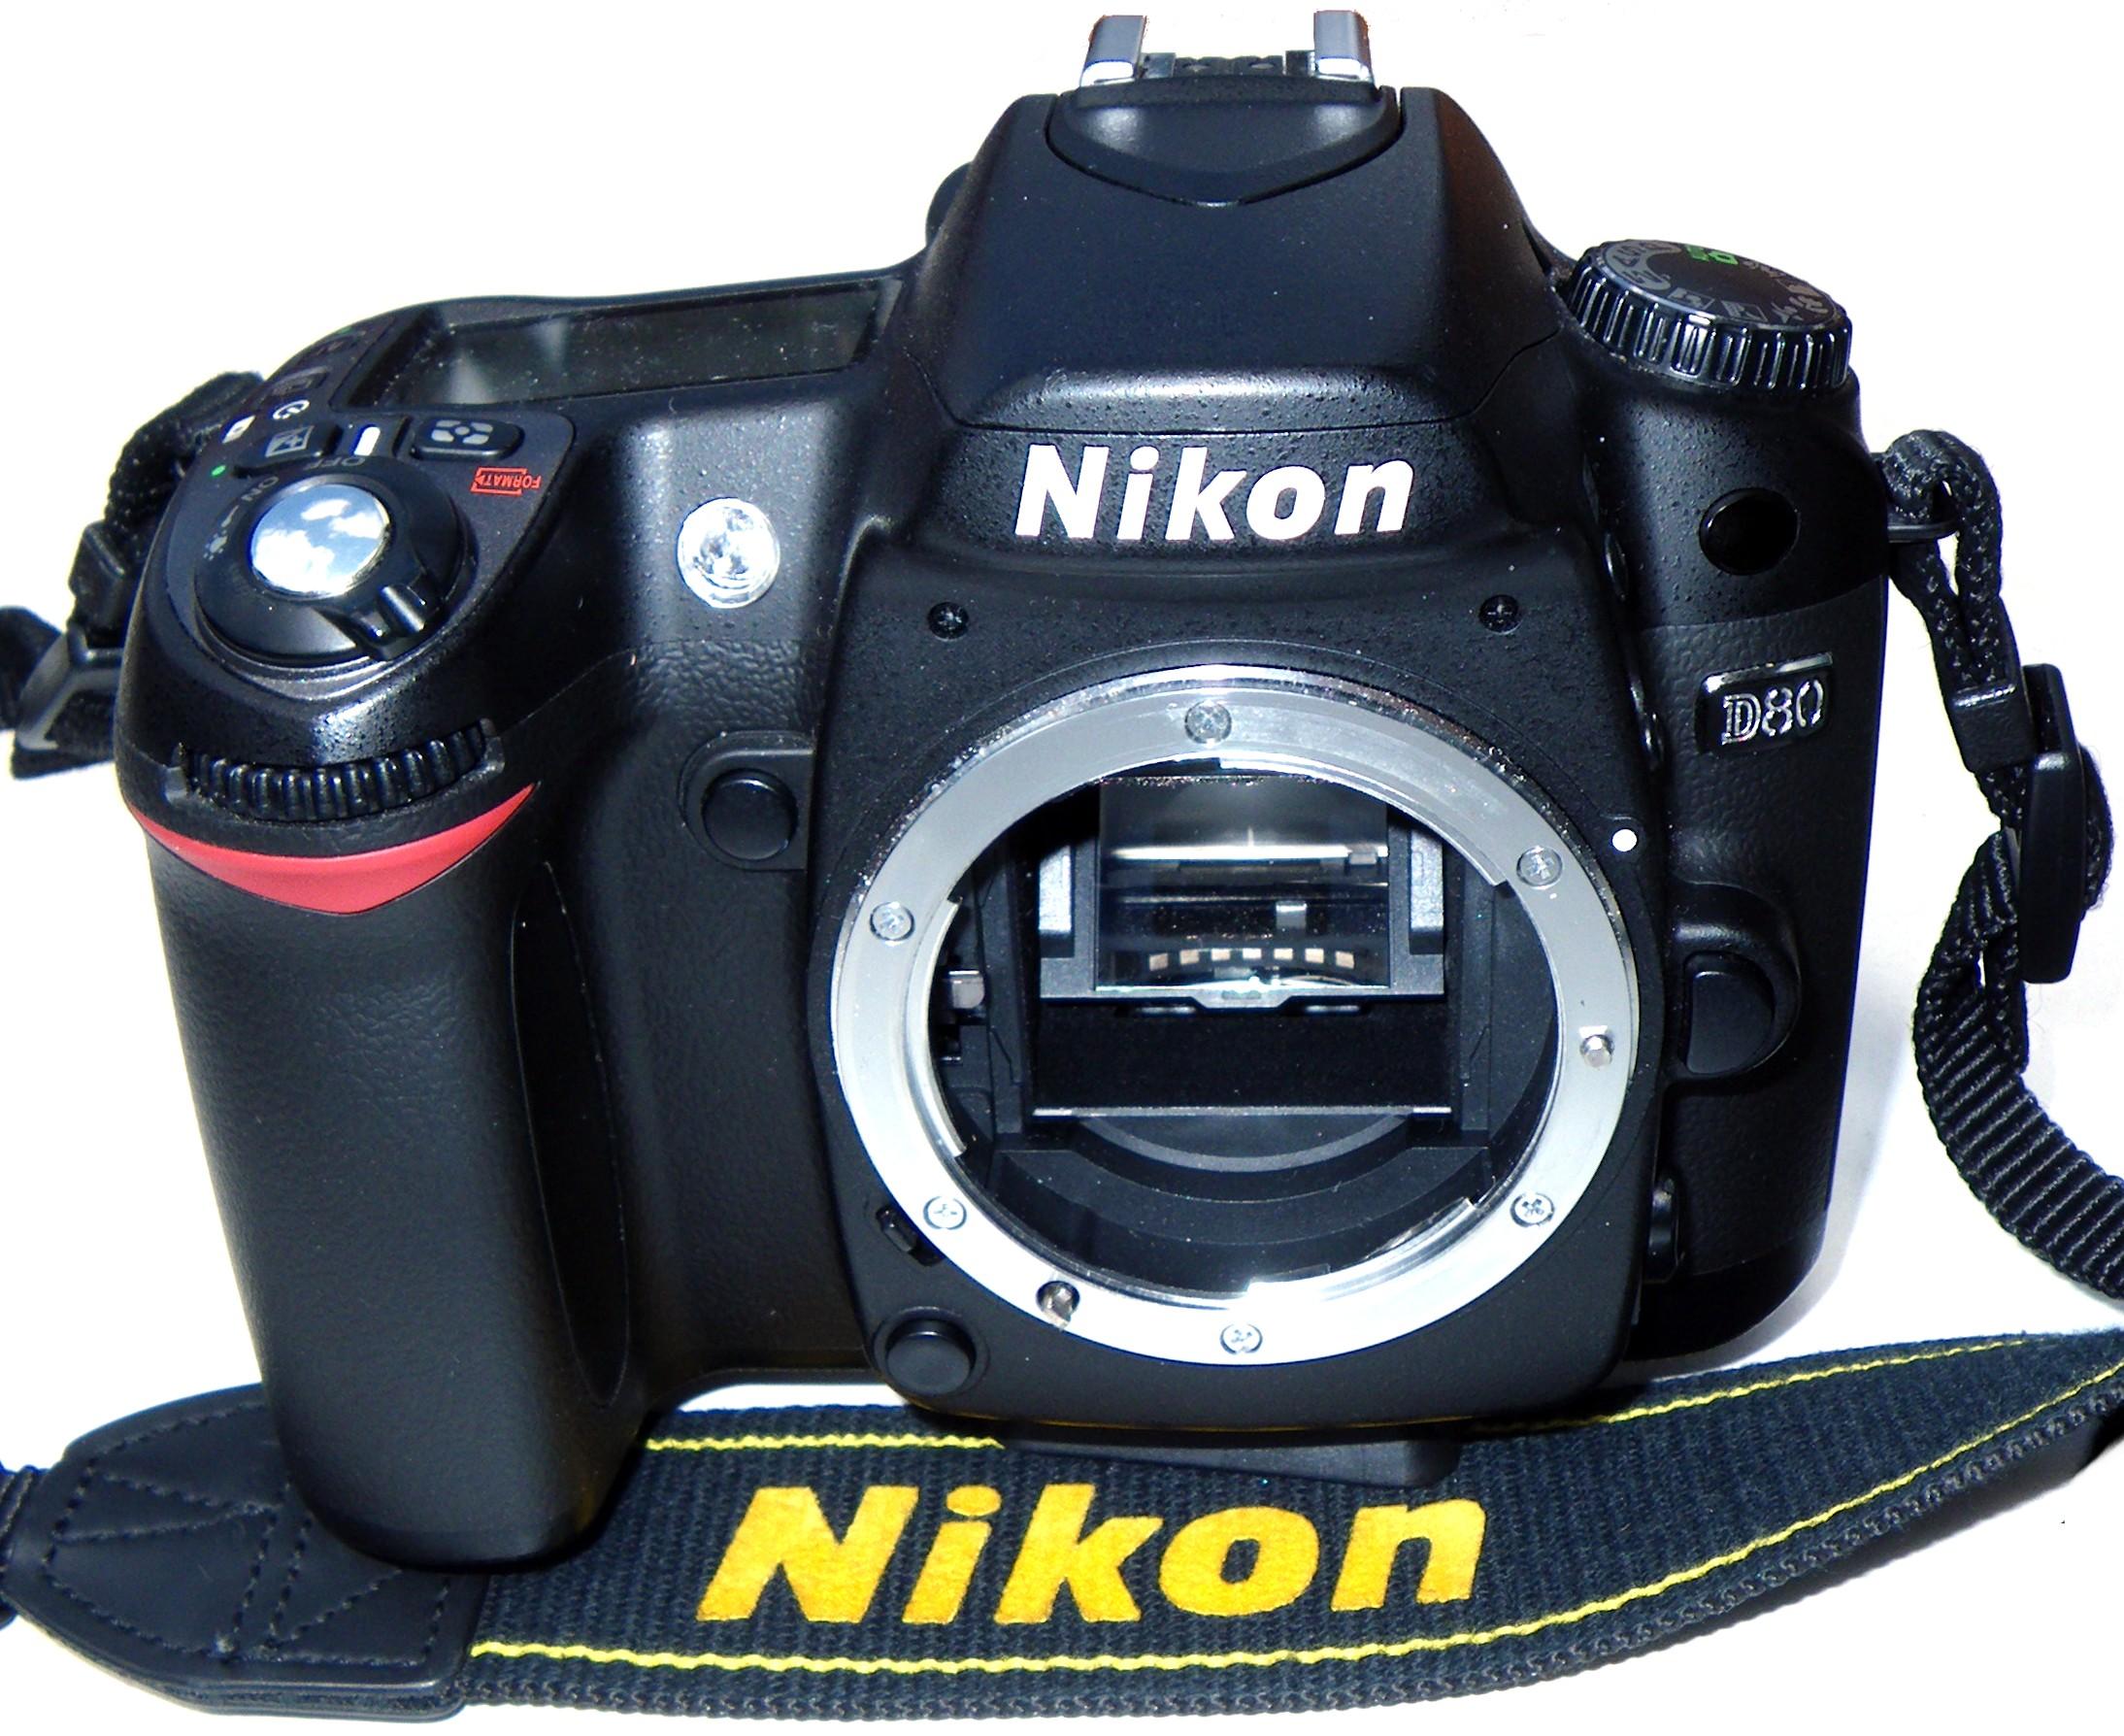 File:Nikon D80 Body.JPG - Wikimedia Commons